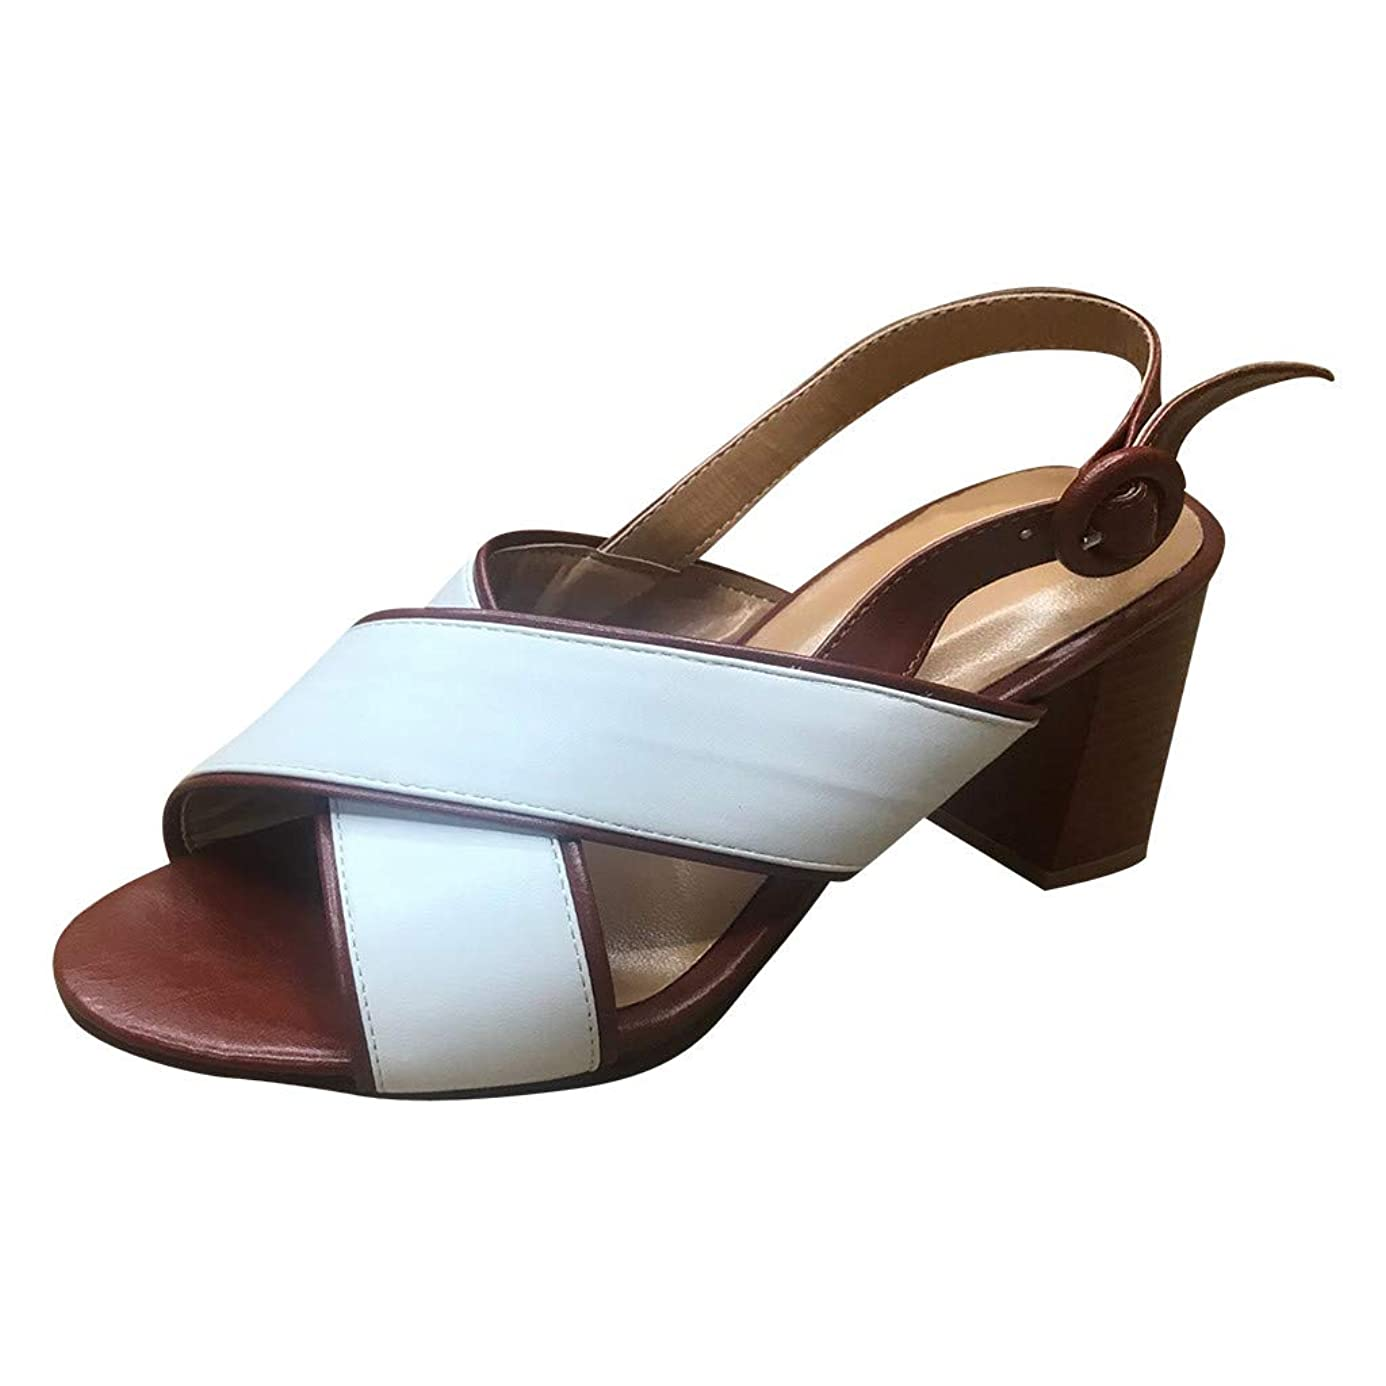 Respctful?Women's Slingback Block Heel Peep Toe Sandals Geniune Leather Platform Wedge Sandals ngk8732760